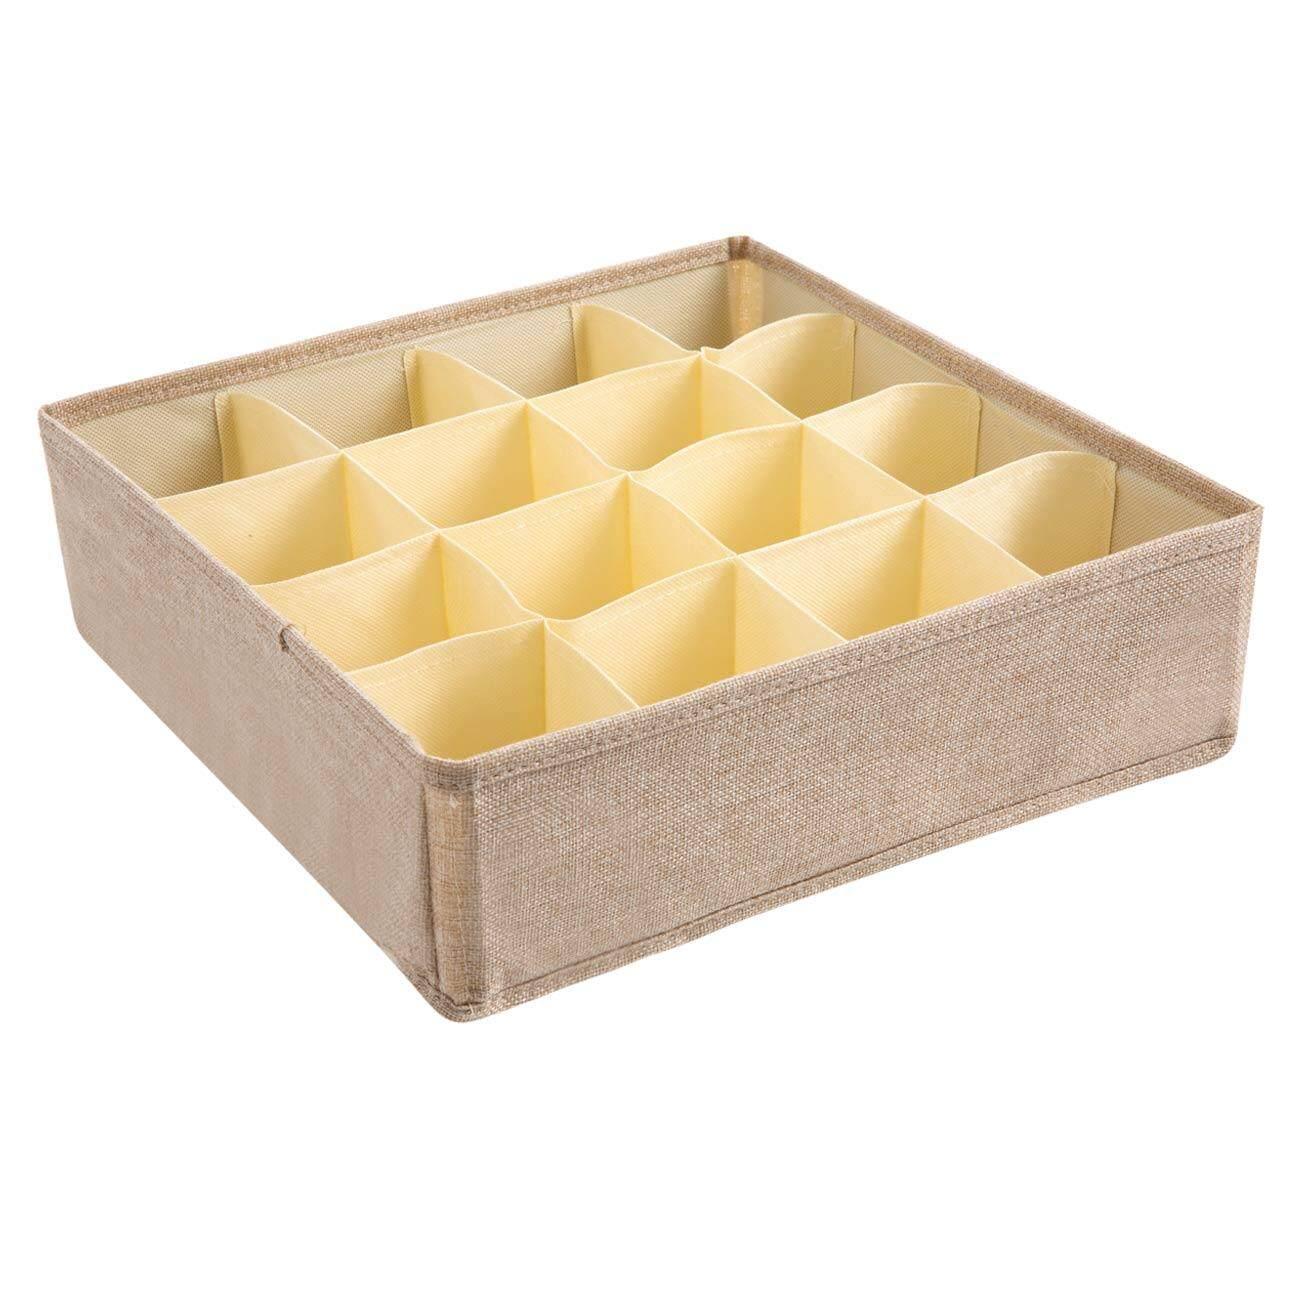 Homenhome 8 or 16 Grids Storage Box Closet Organizer For Underwear Bra  Scarfs Socks